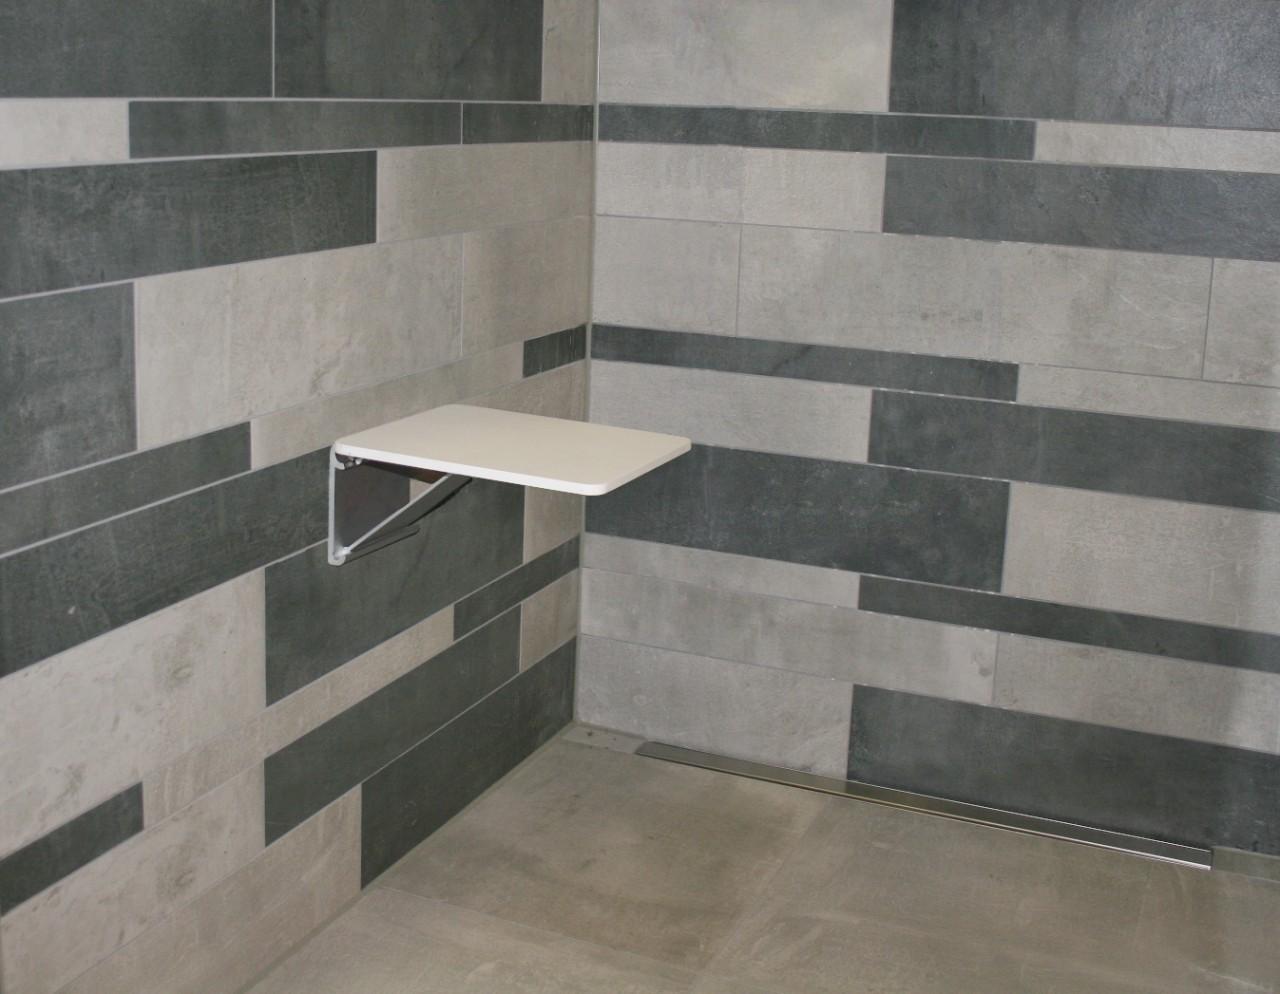 Corian Badkamer Onderhoud : Badkamer r jacobs solid surface